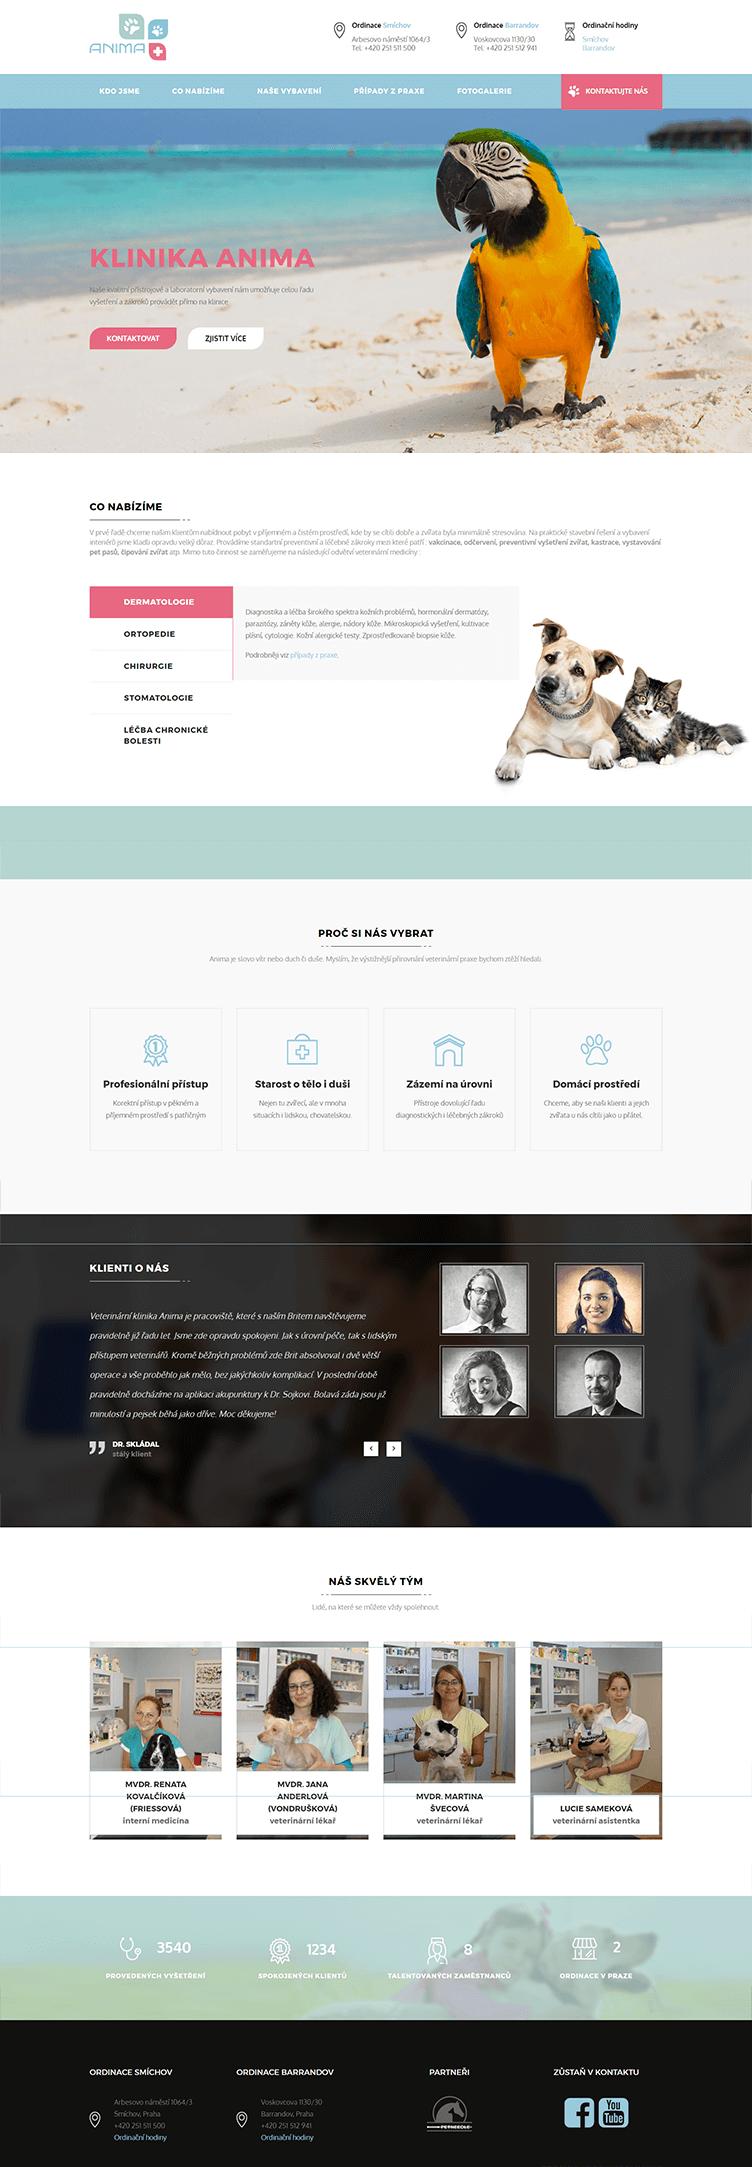 klinika anima – web na šabloně